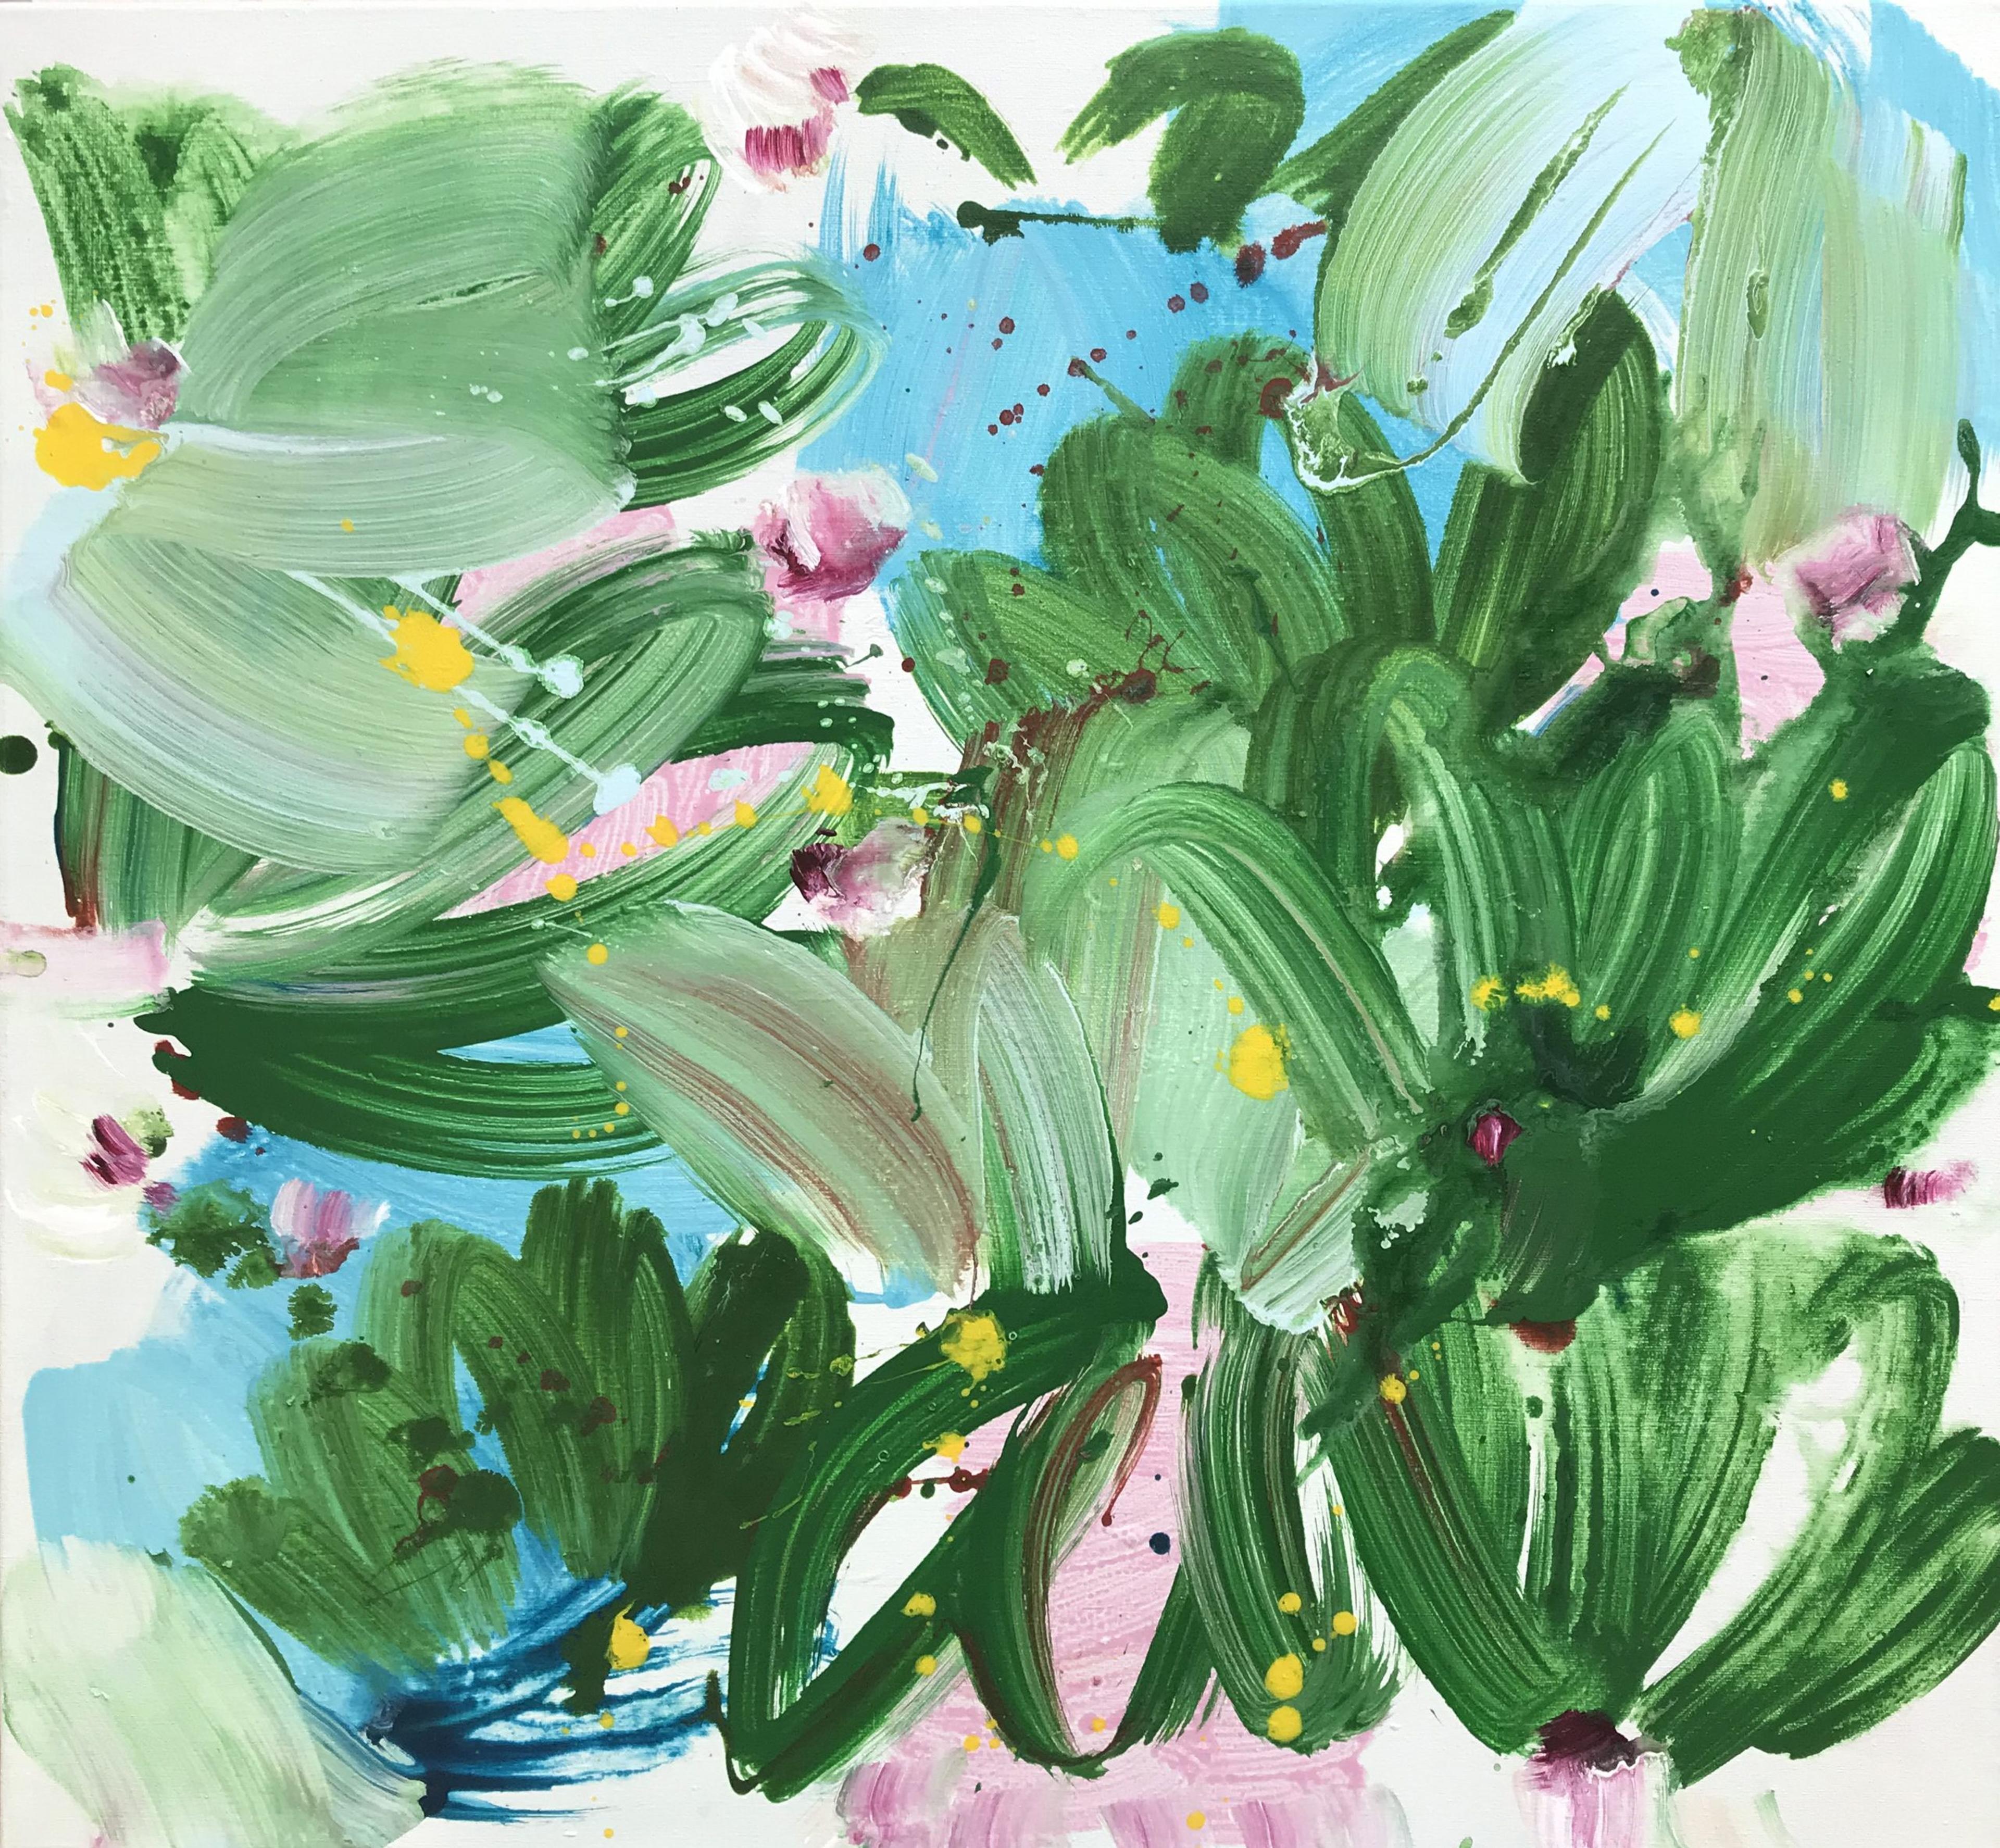 artwork Blau Grün by Miye Lee